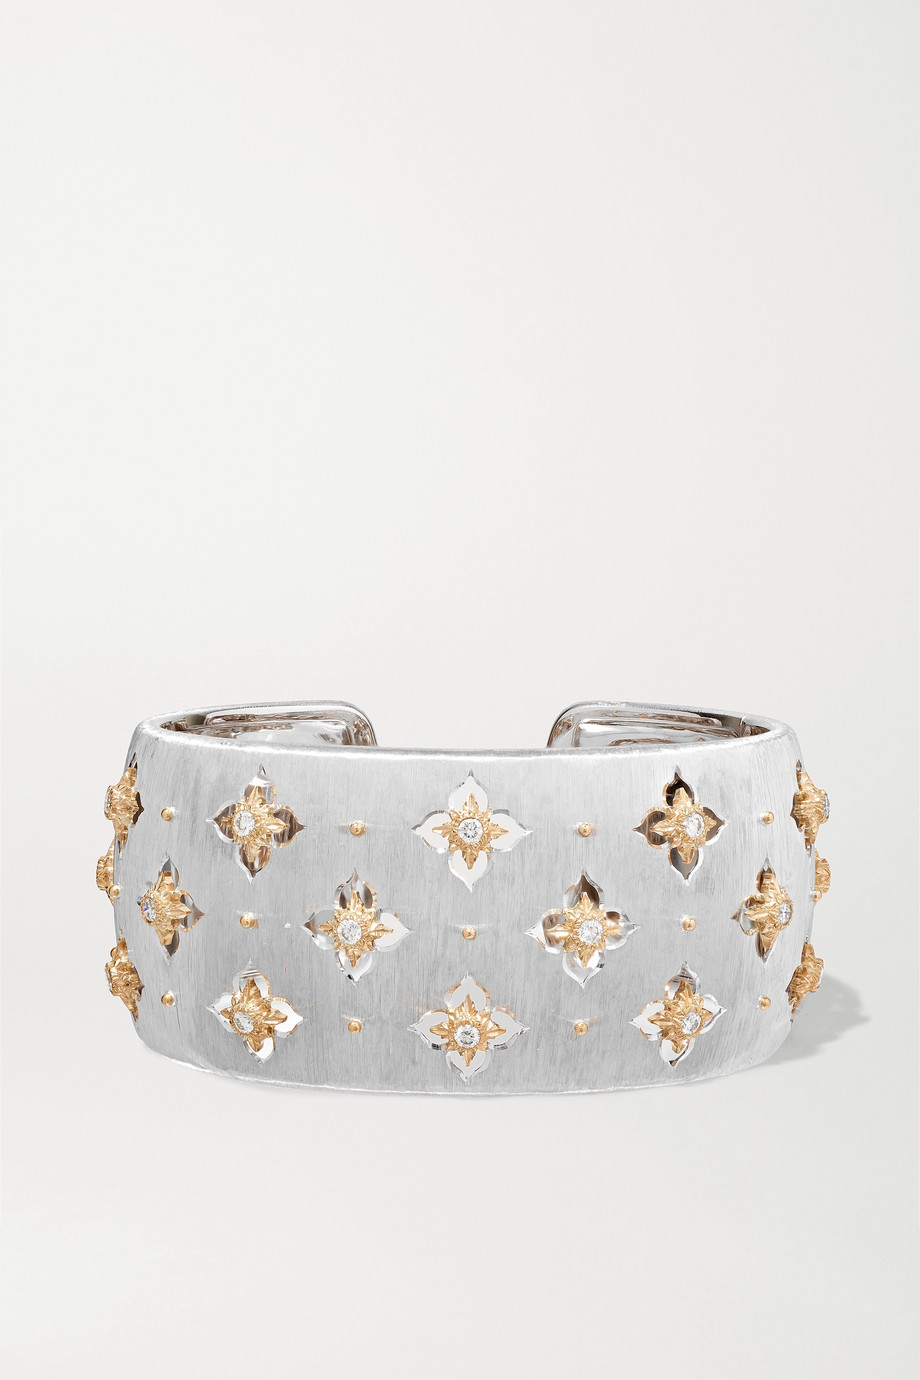 Buccellati Macri Giglio 18-karat white and yellow gold diamond cuff